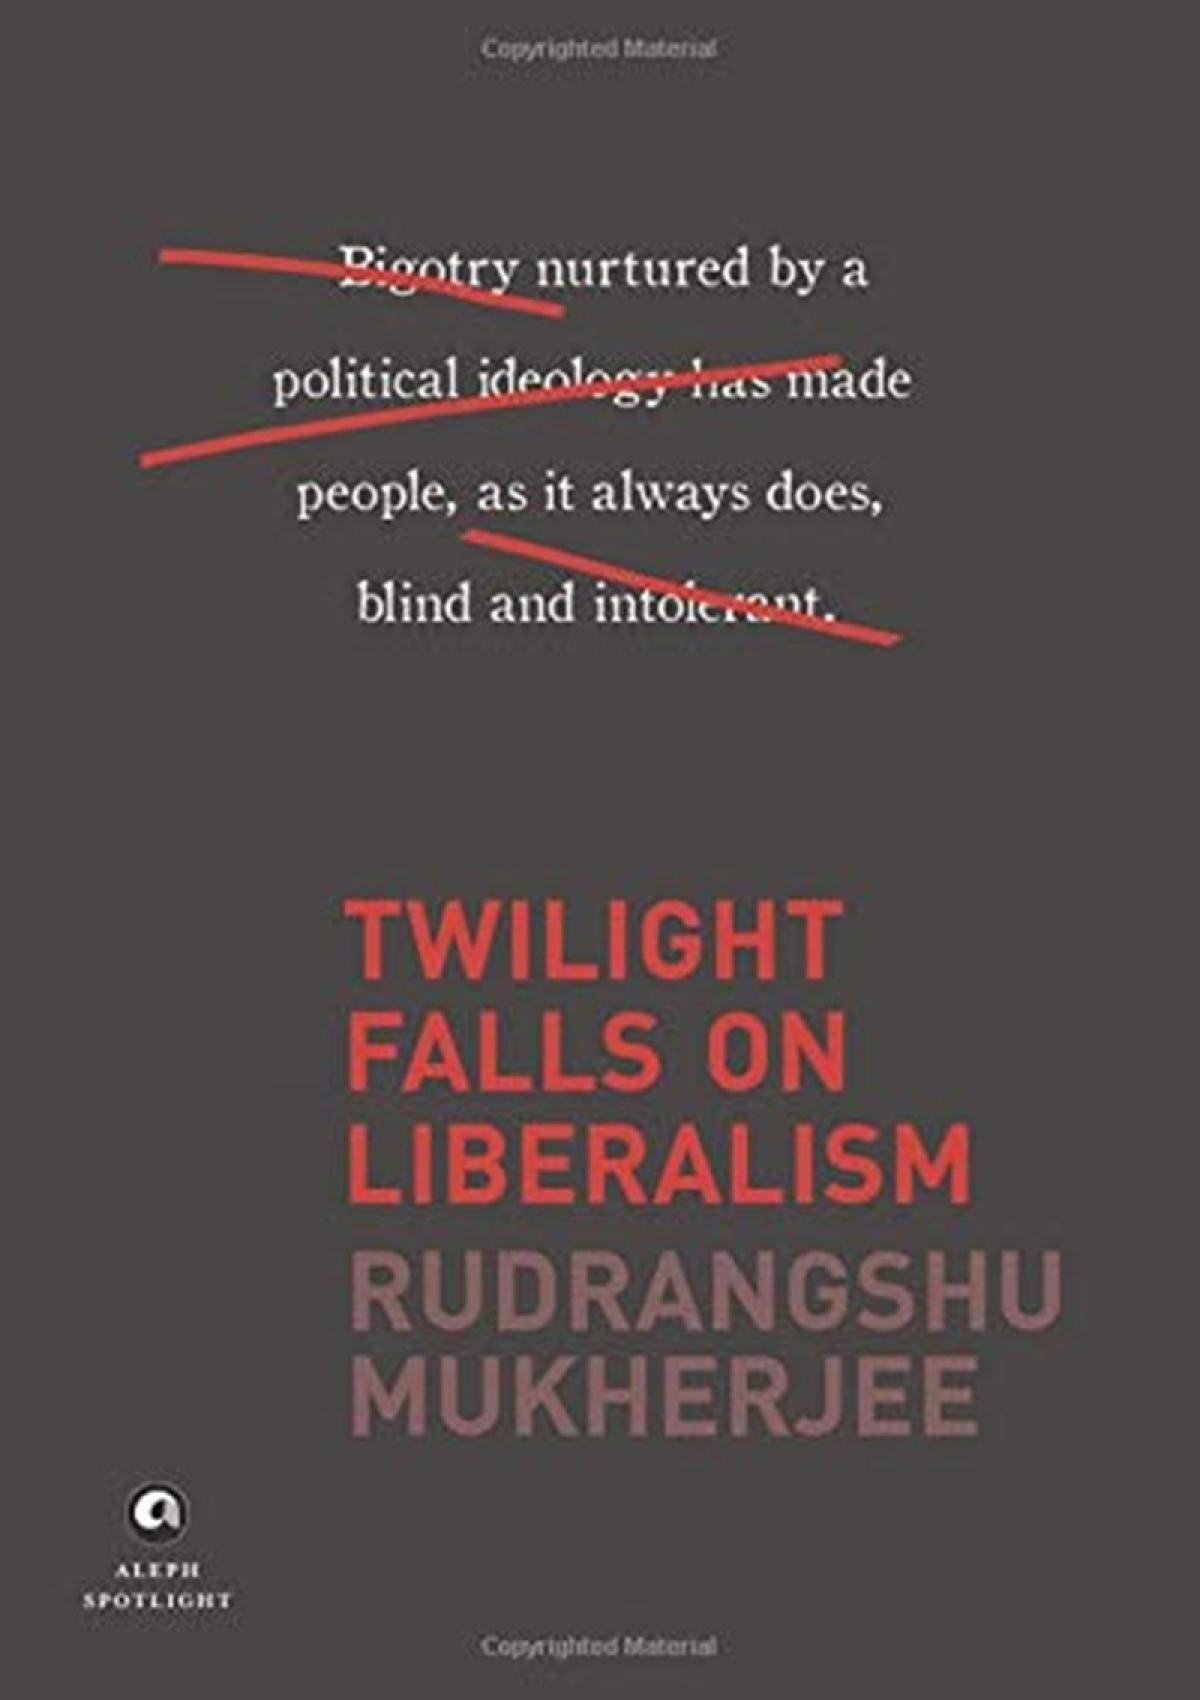 Twilight falls on liberalism by Rudrangshu Mukherjee: Review